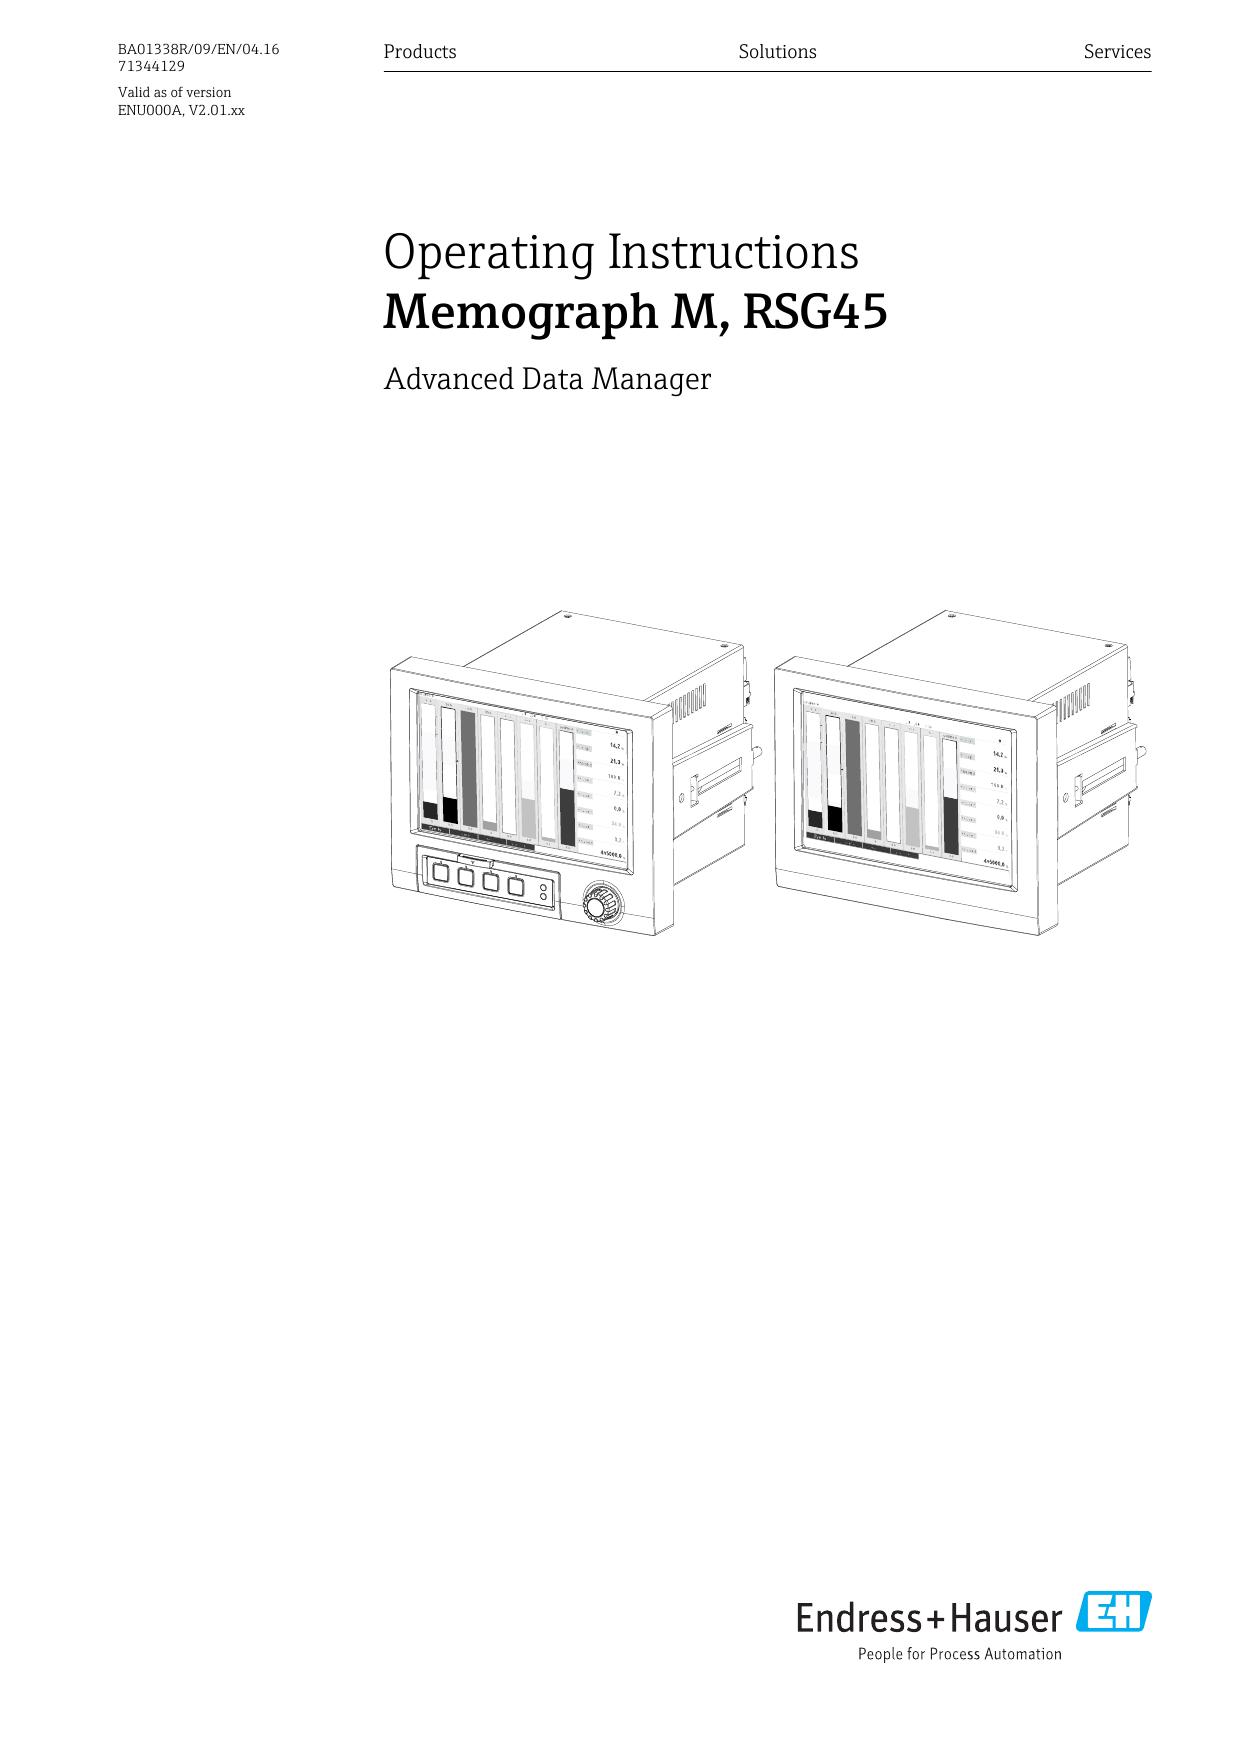 Memograph M, RSG45 - Endress+Hauser Portal   manualzz.com on